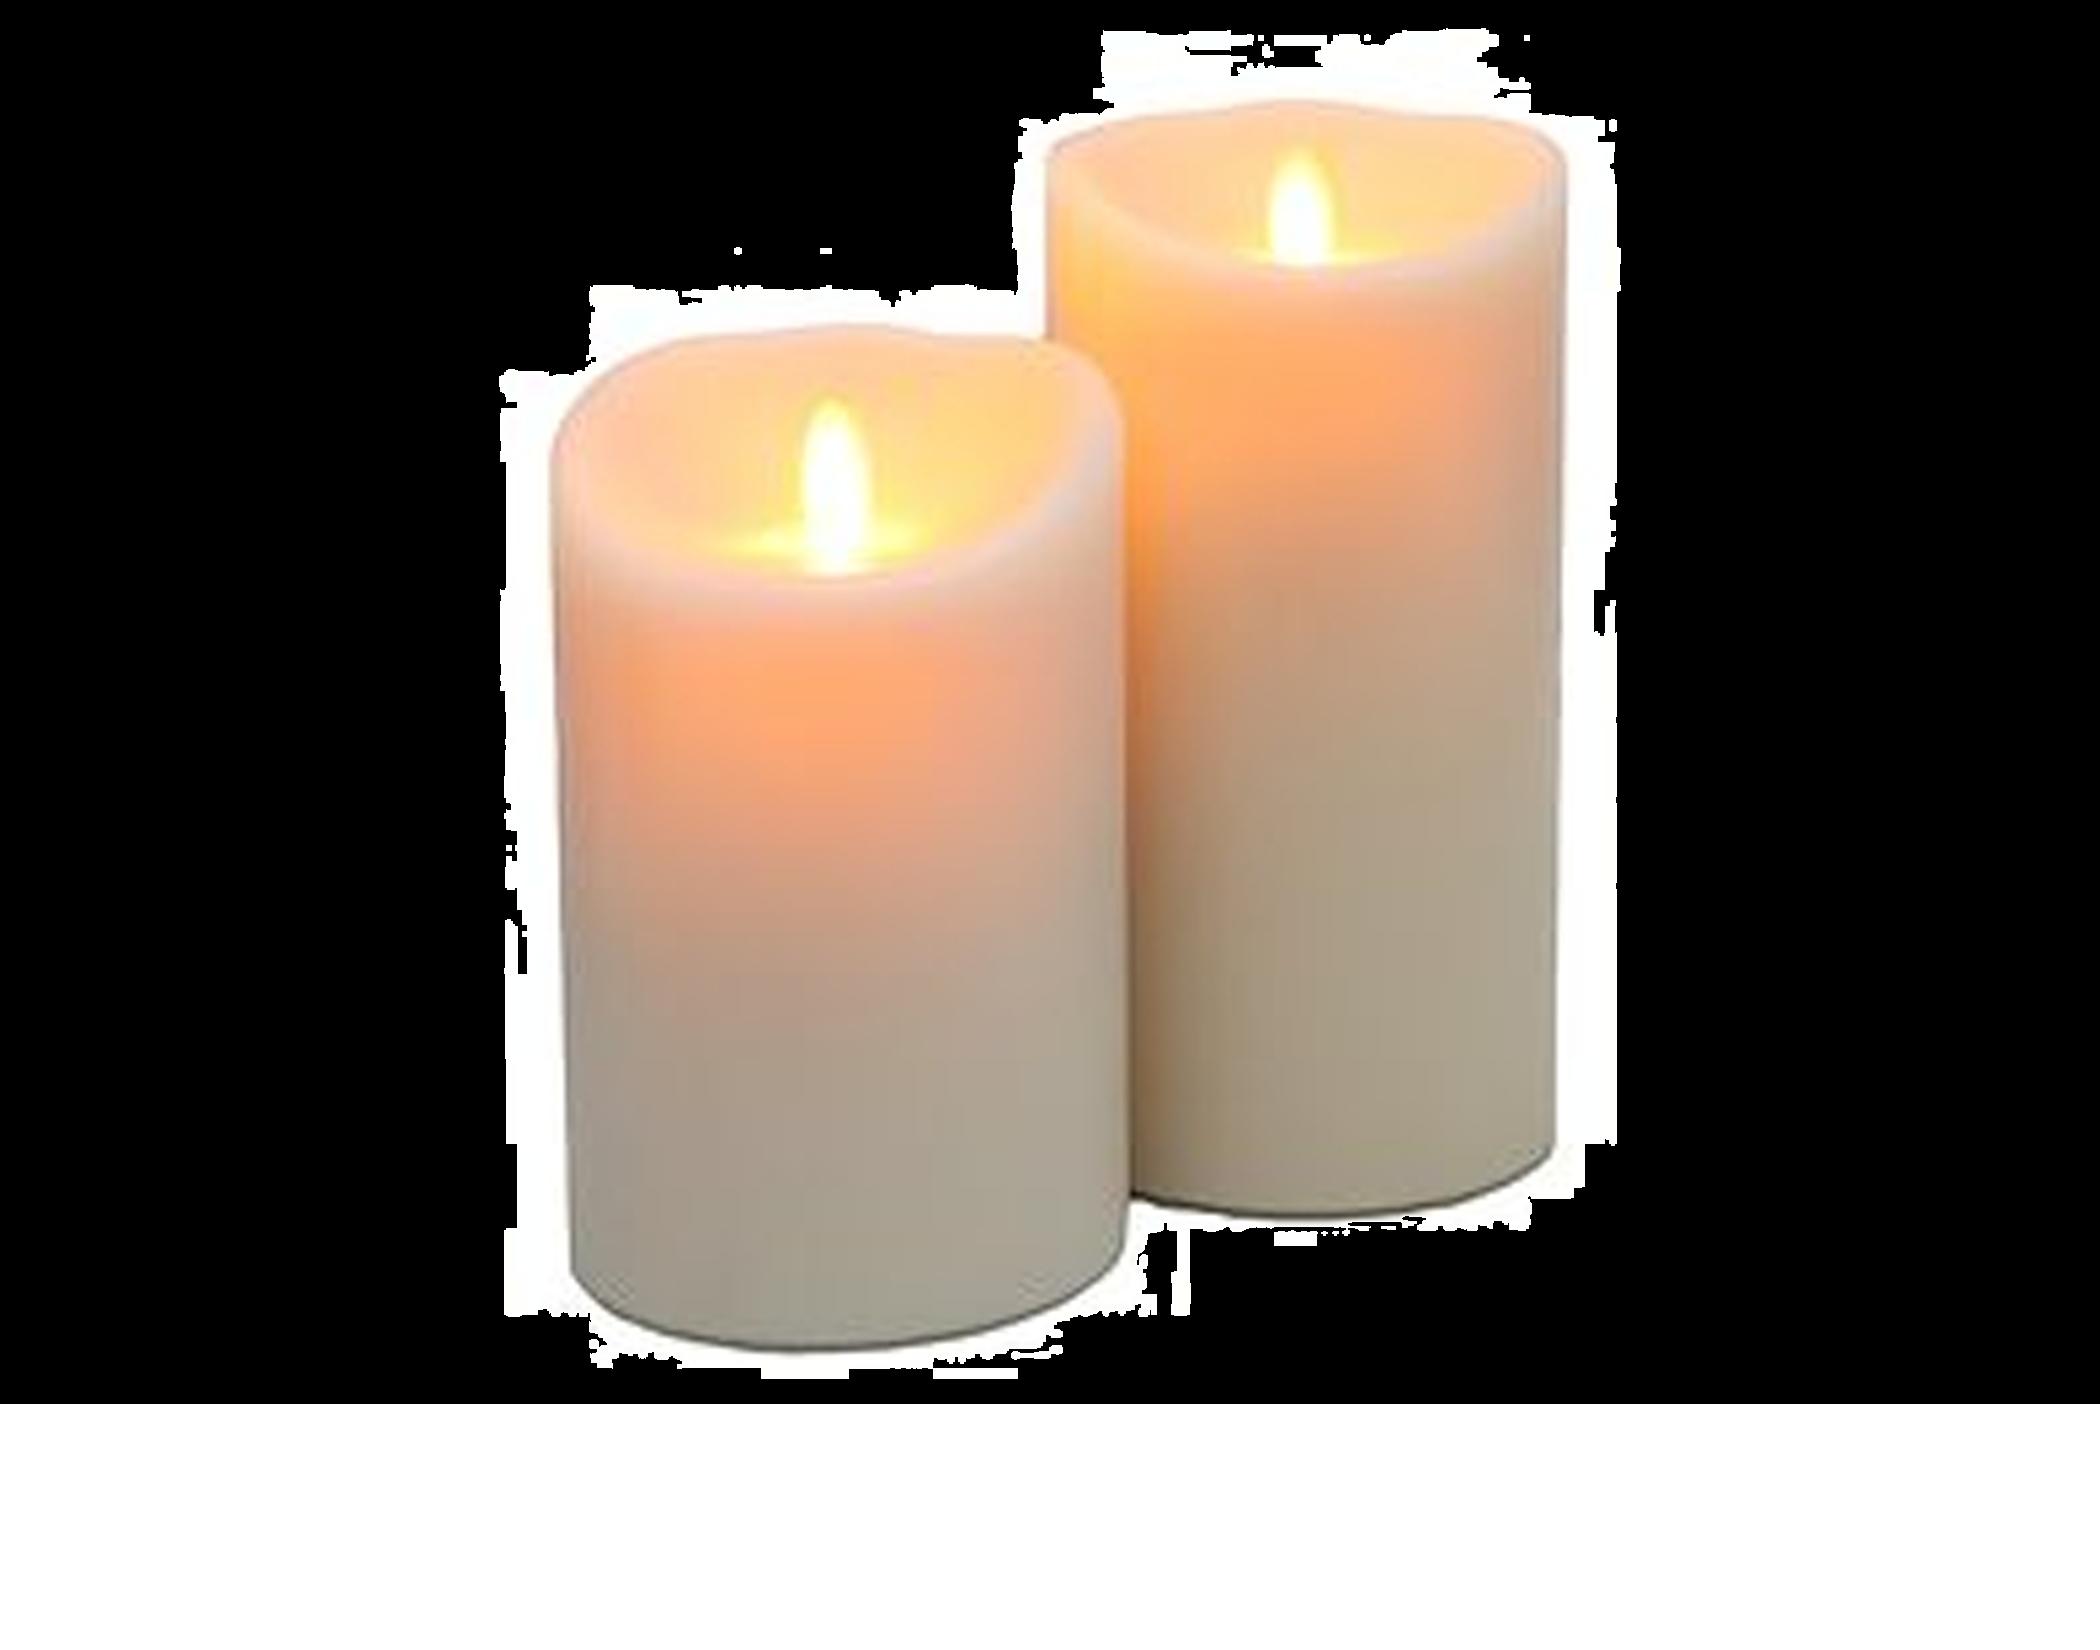 Burning Candle Png Hd - Candles Free Png Image Png Image   Candle Png Hd, Transparent background PNG HD thumbnail